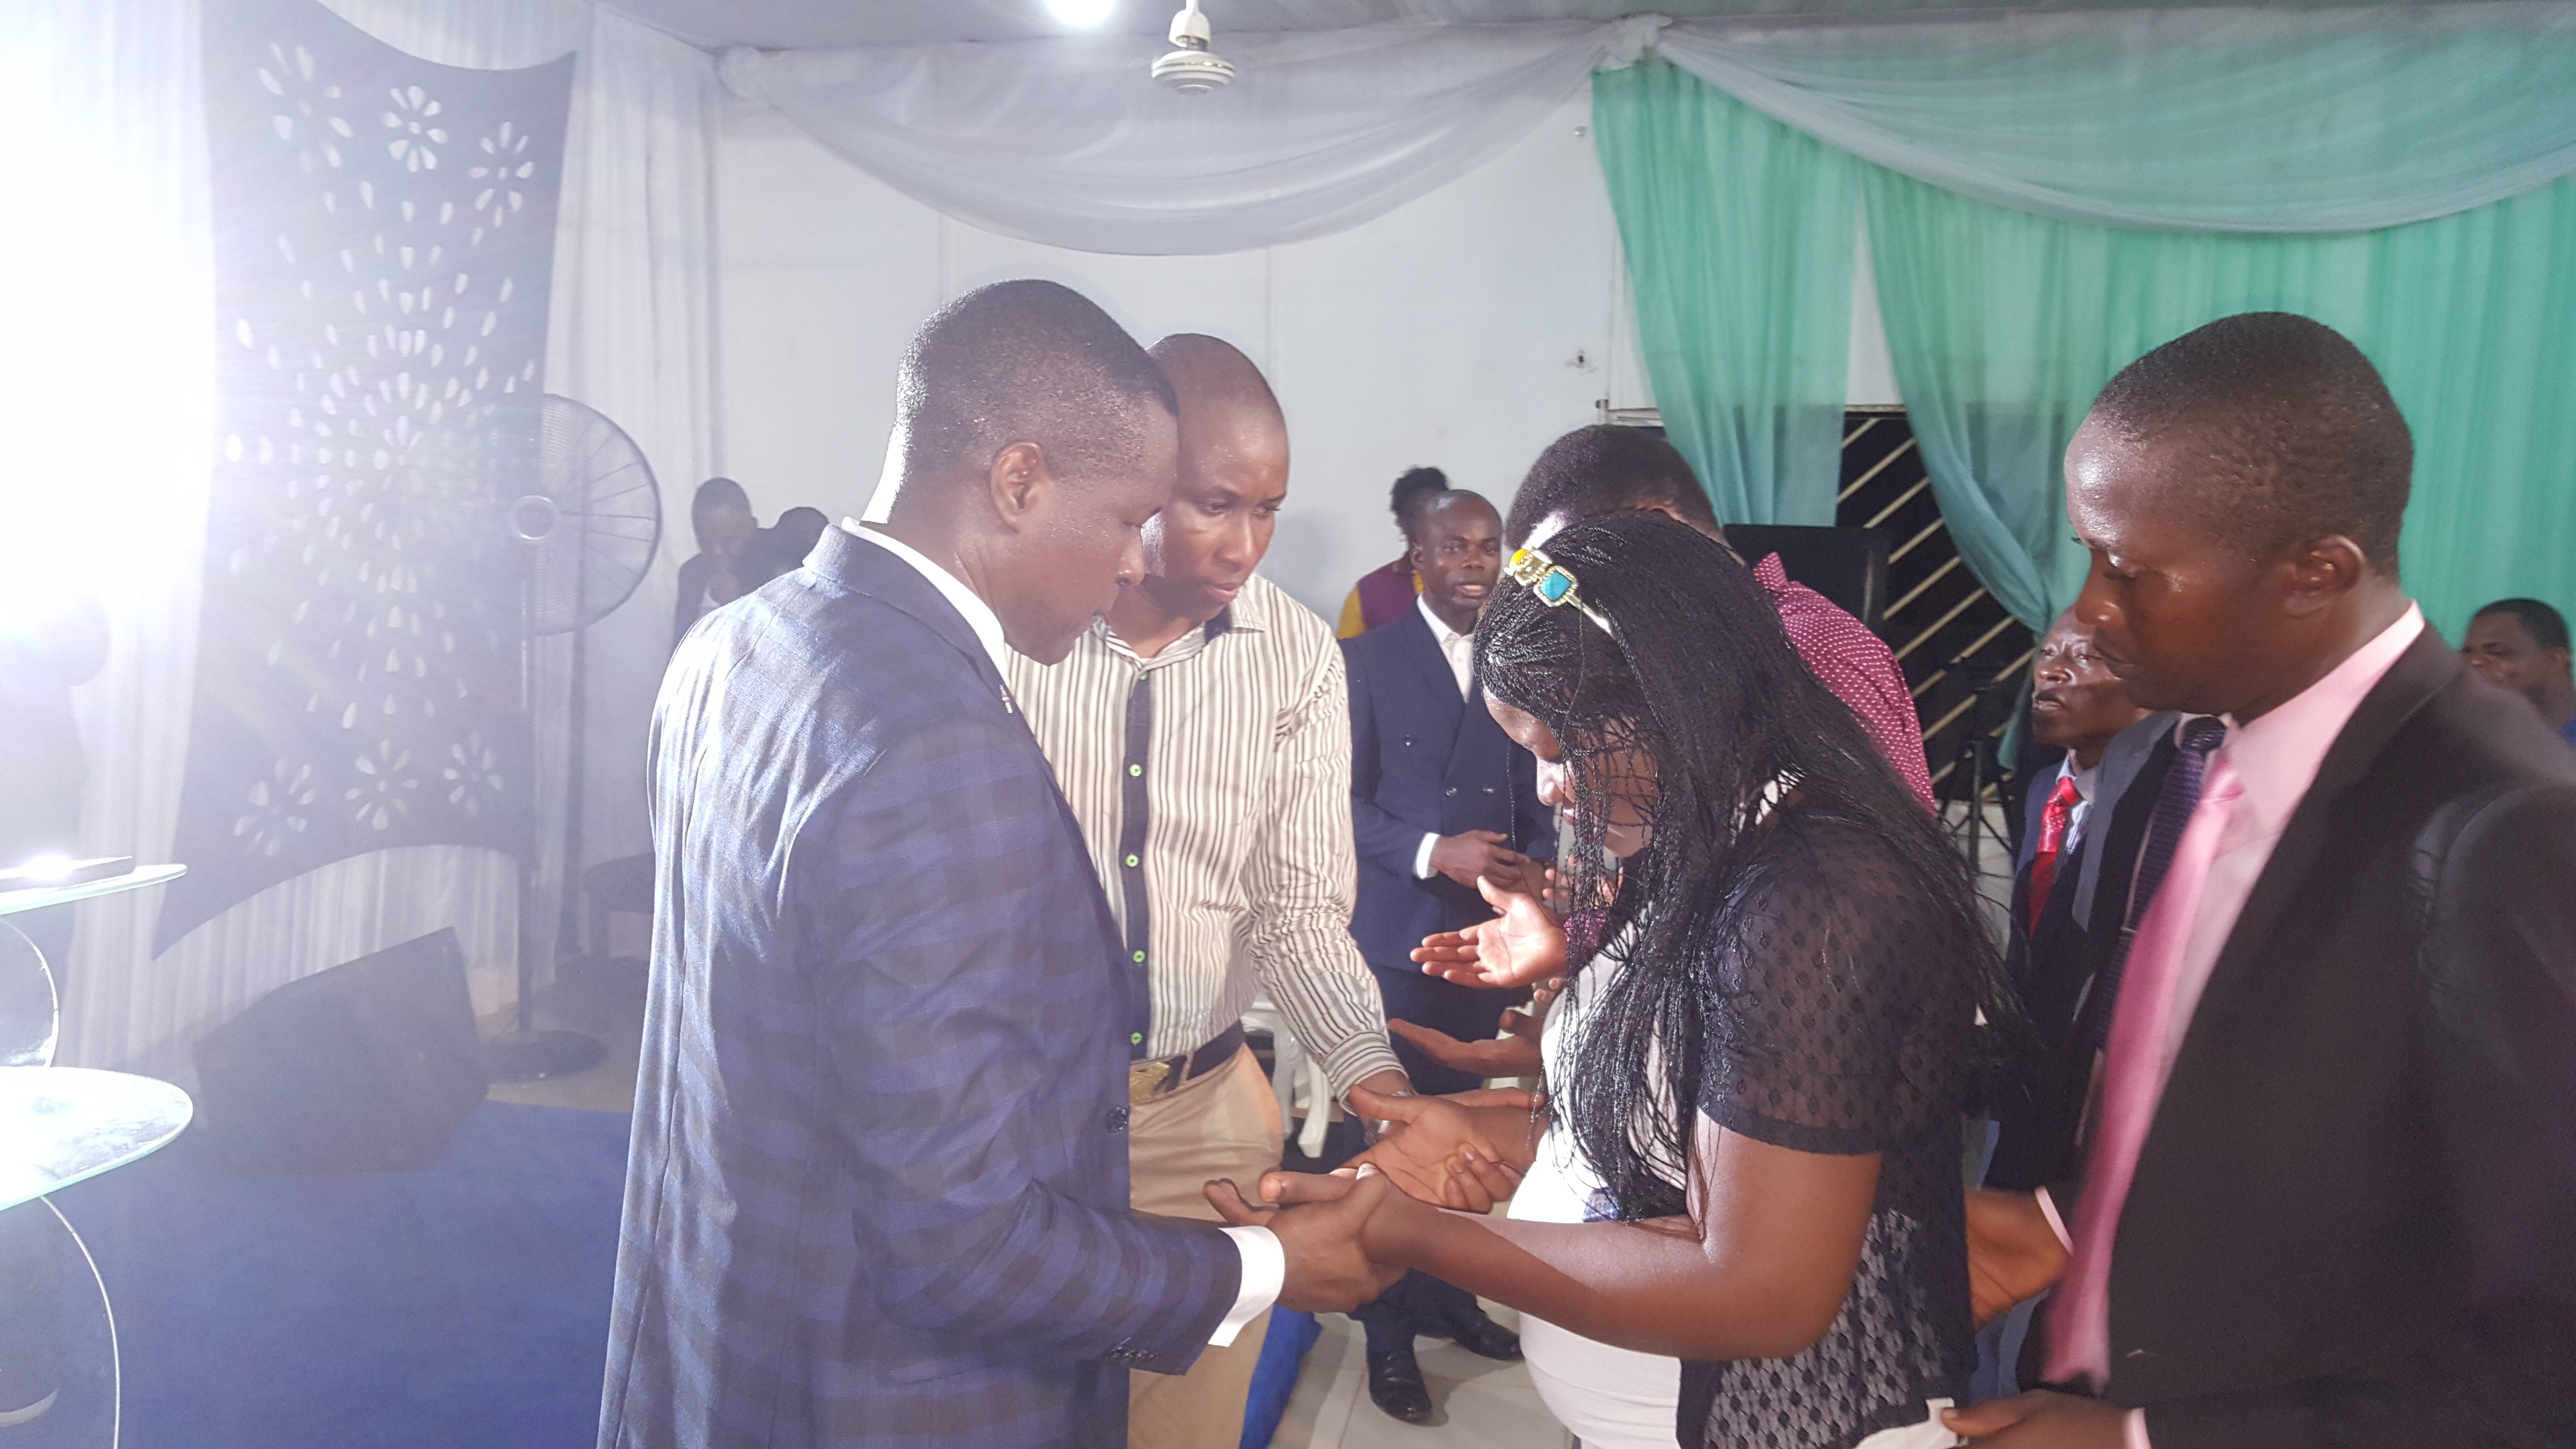 Pastor Moses announces 7 days